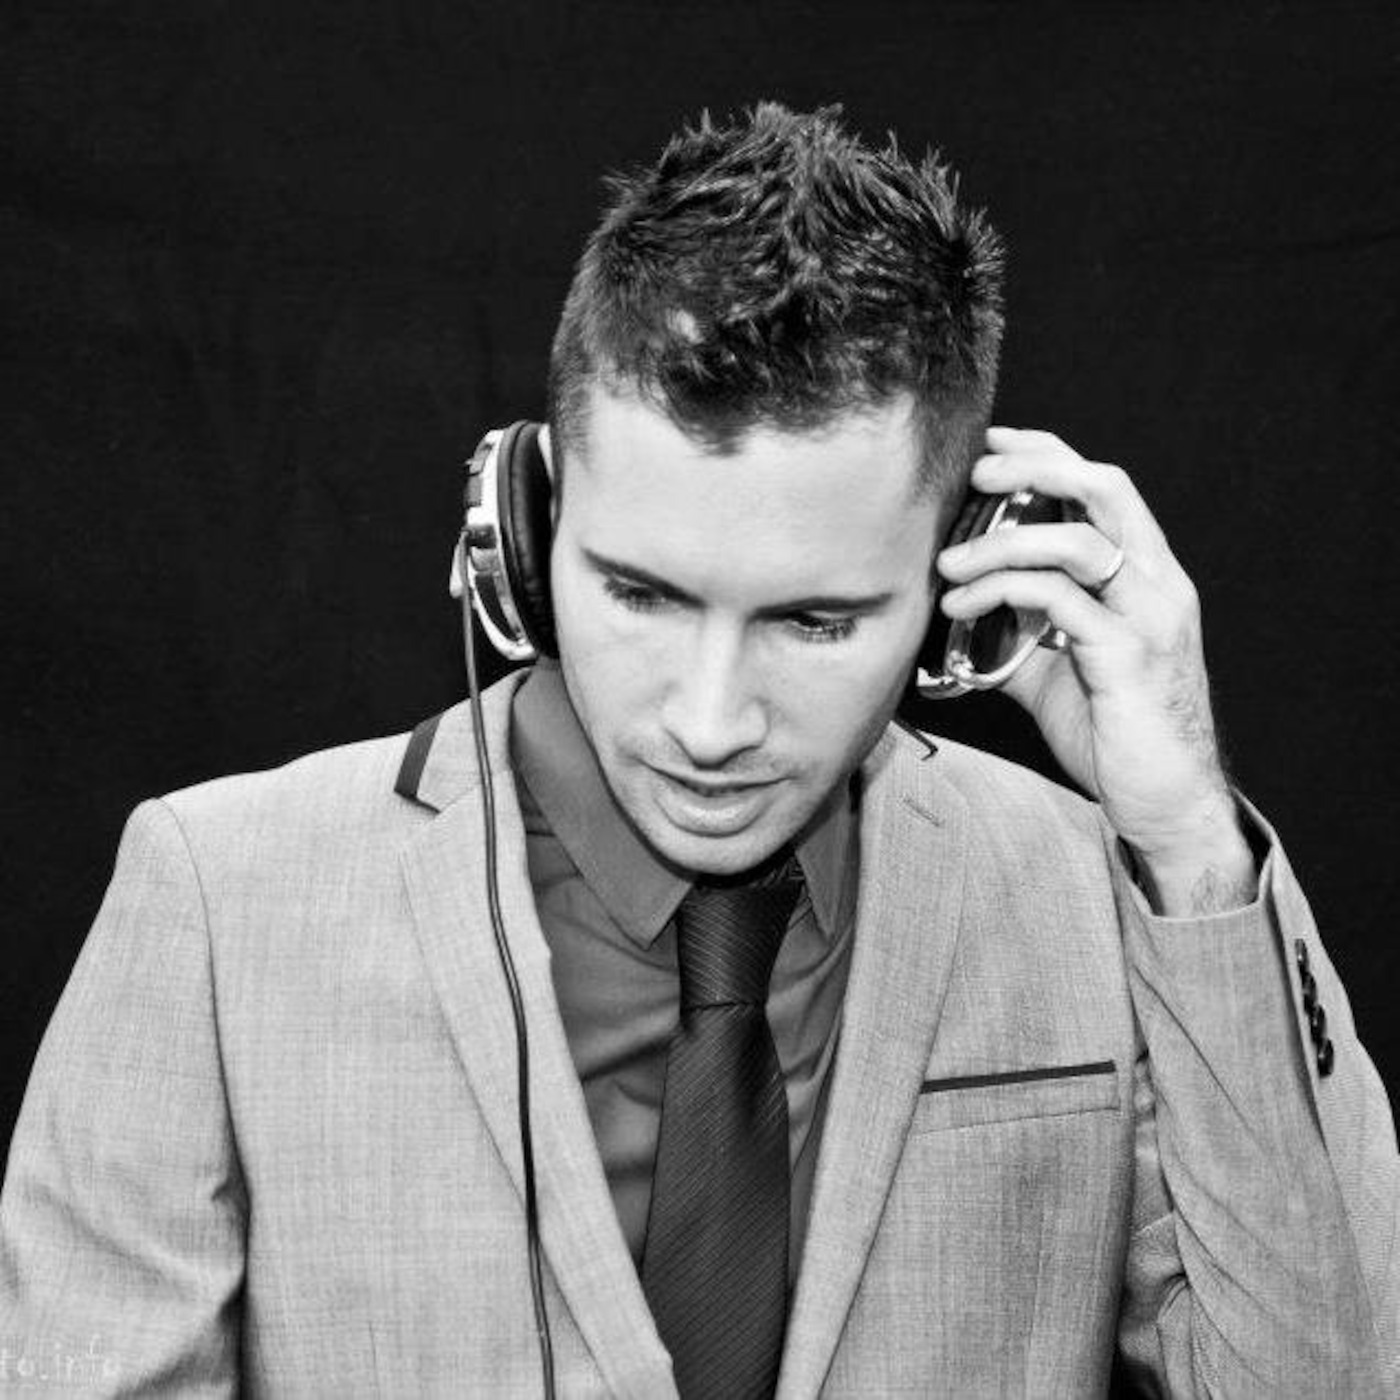 DJ Marty Hoeft